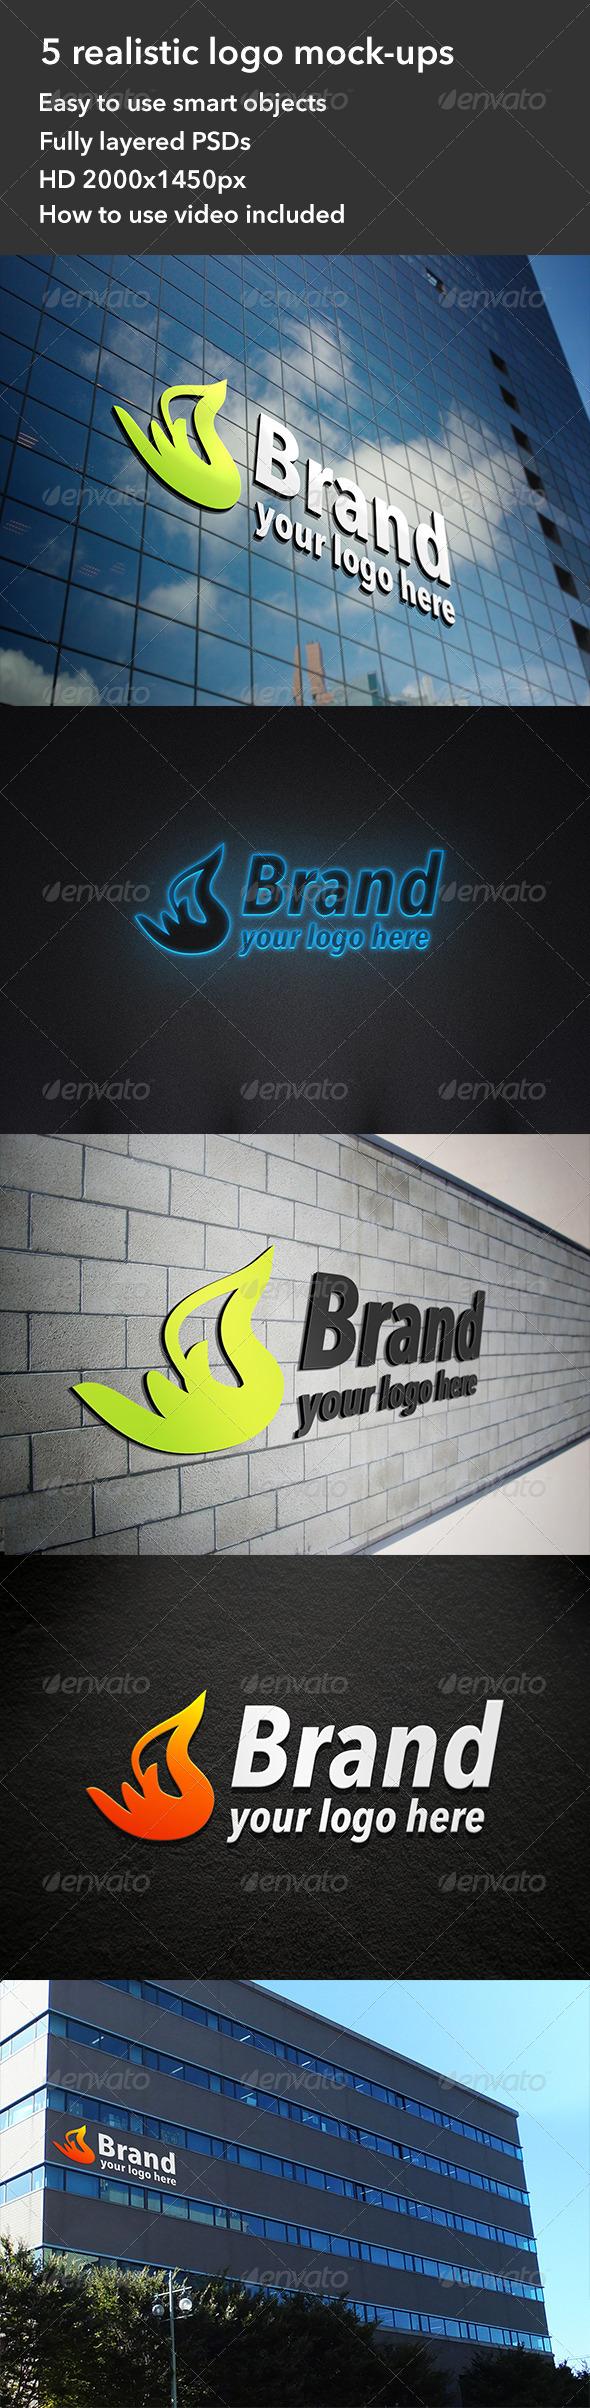 5 Realistic Interior & Exterior Logo Mockups - Miscellaneous Product Mock-Ups